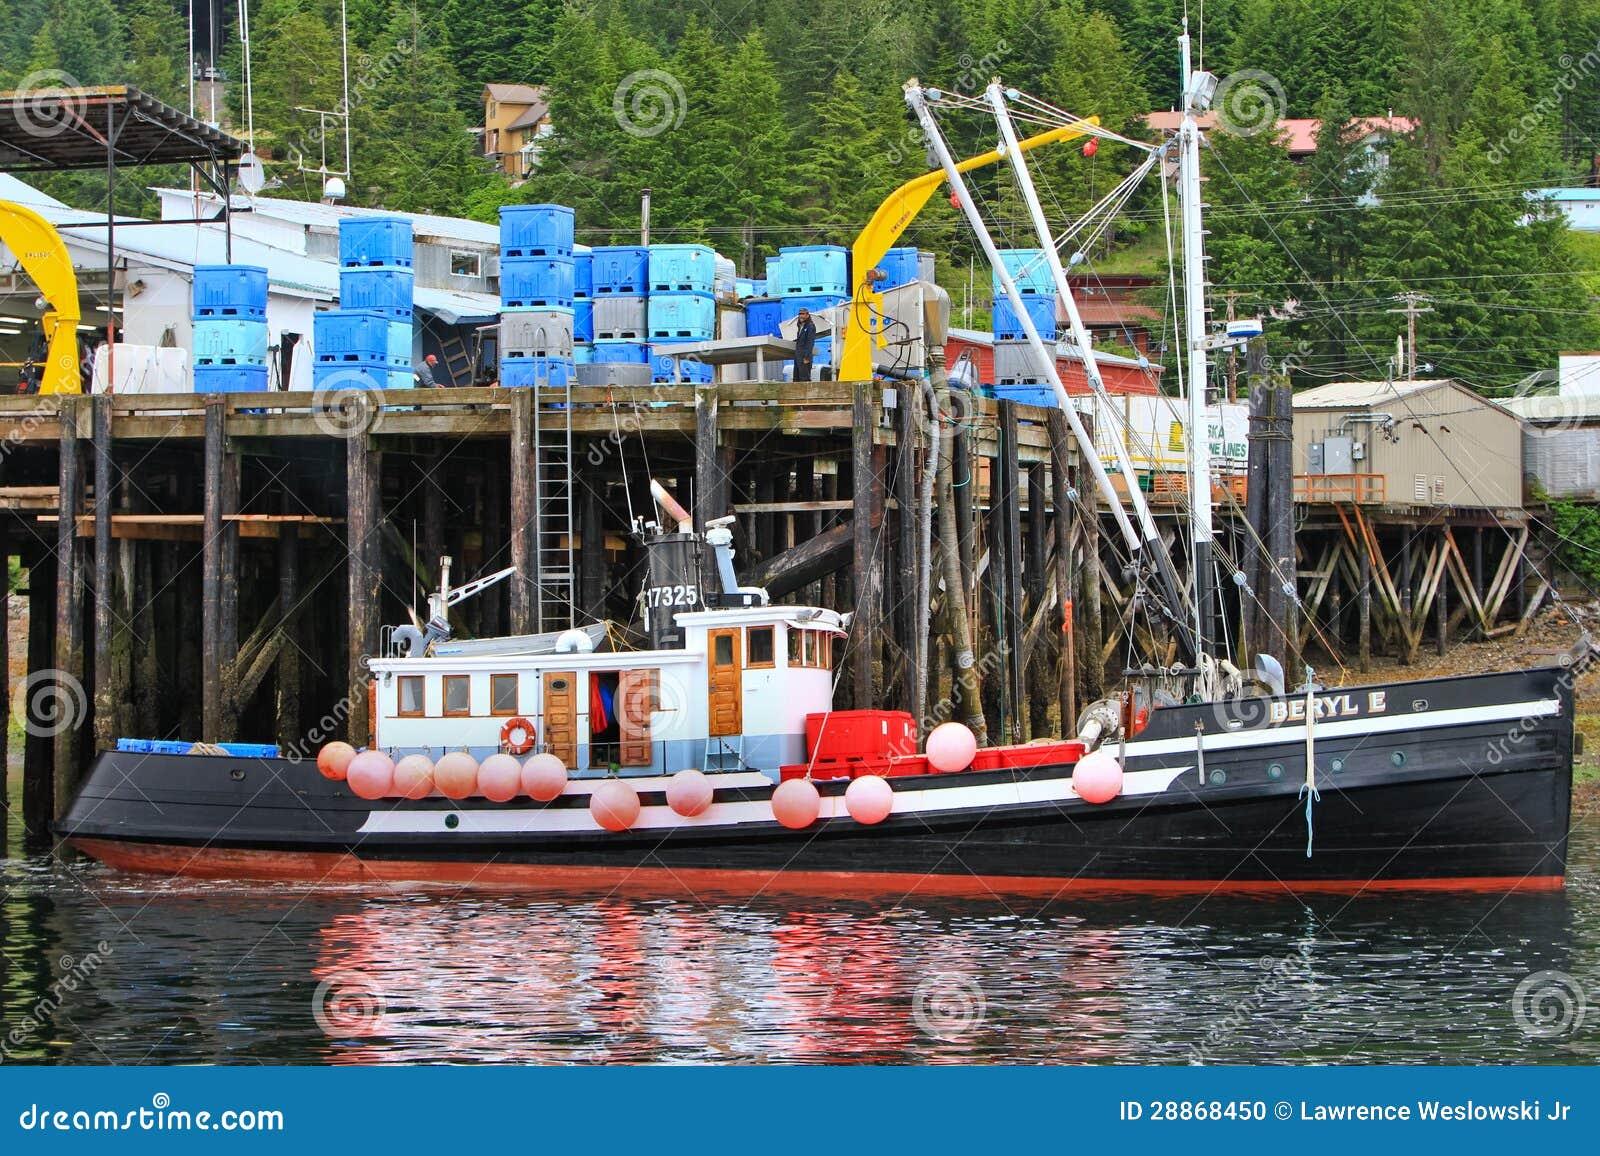 Alaska hoonah fishing trawler boat editorial image for Alaska out of state fishing license